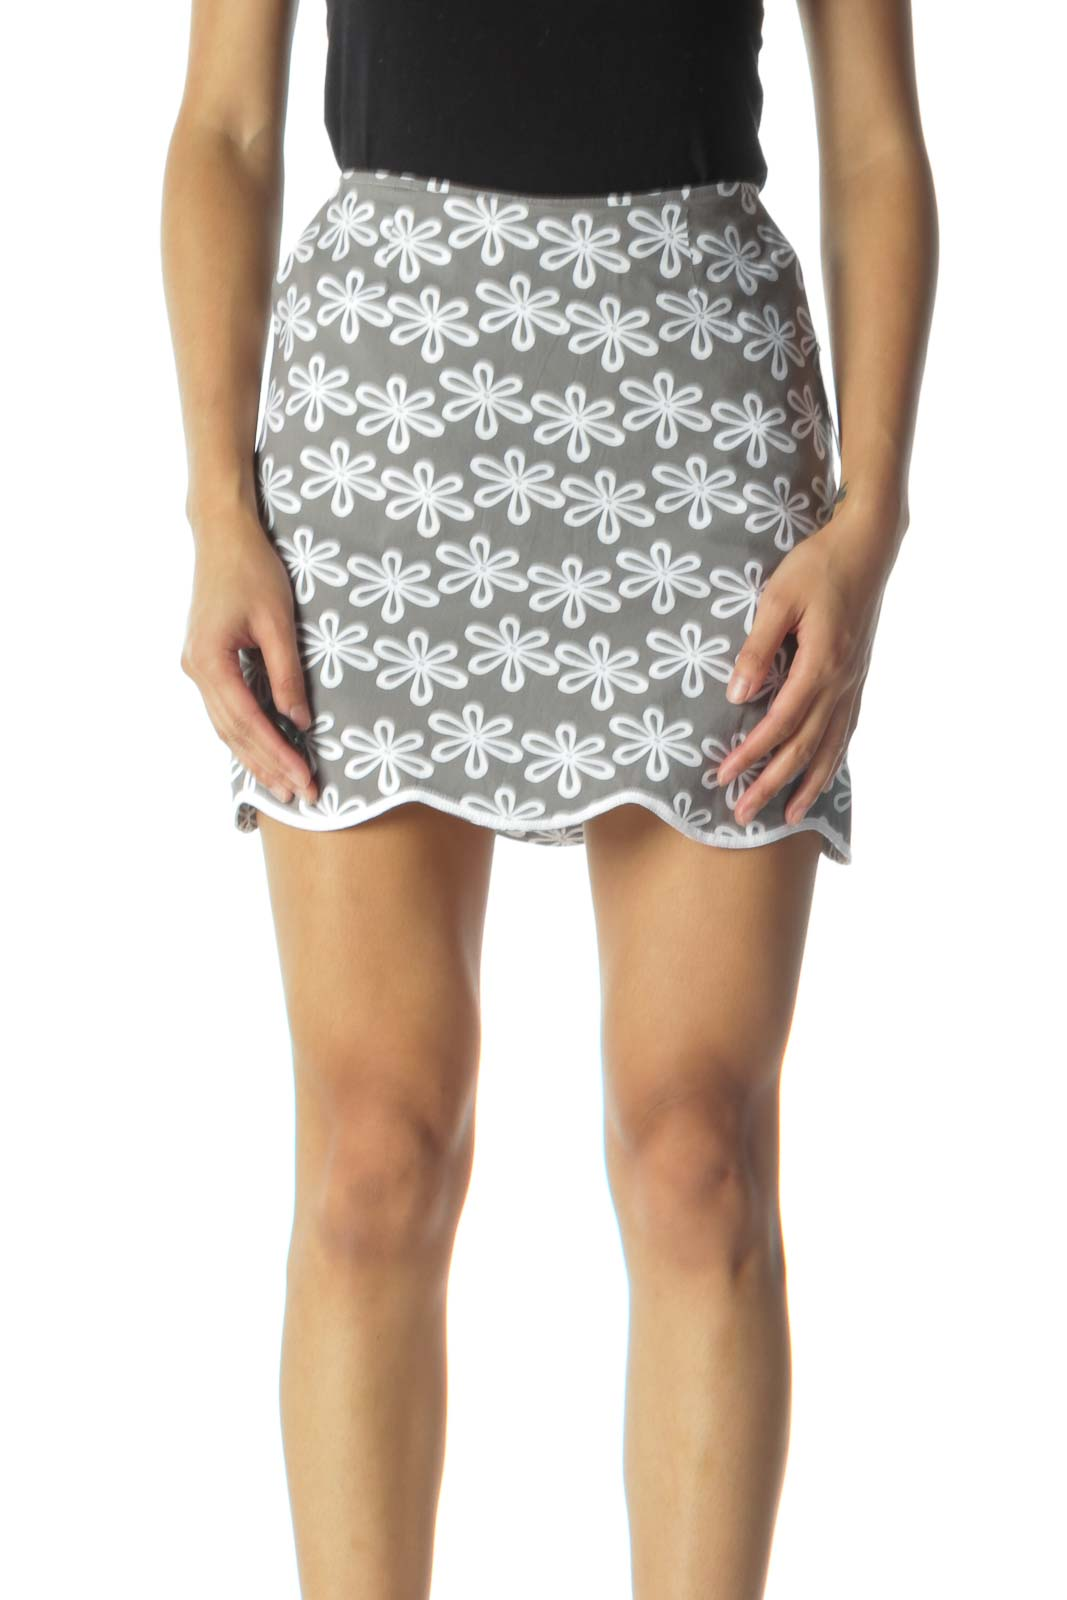 Gray and White Flower Print Scalloped Skirt Front